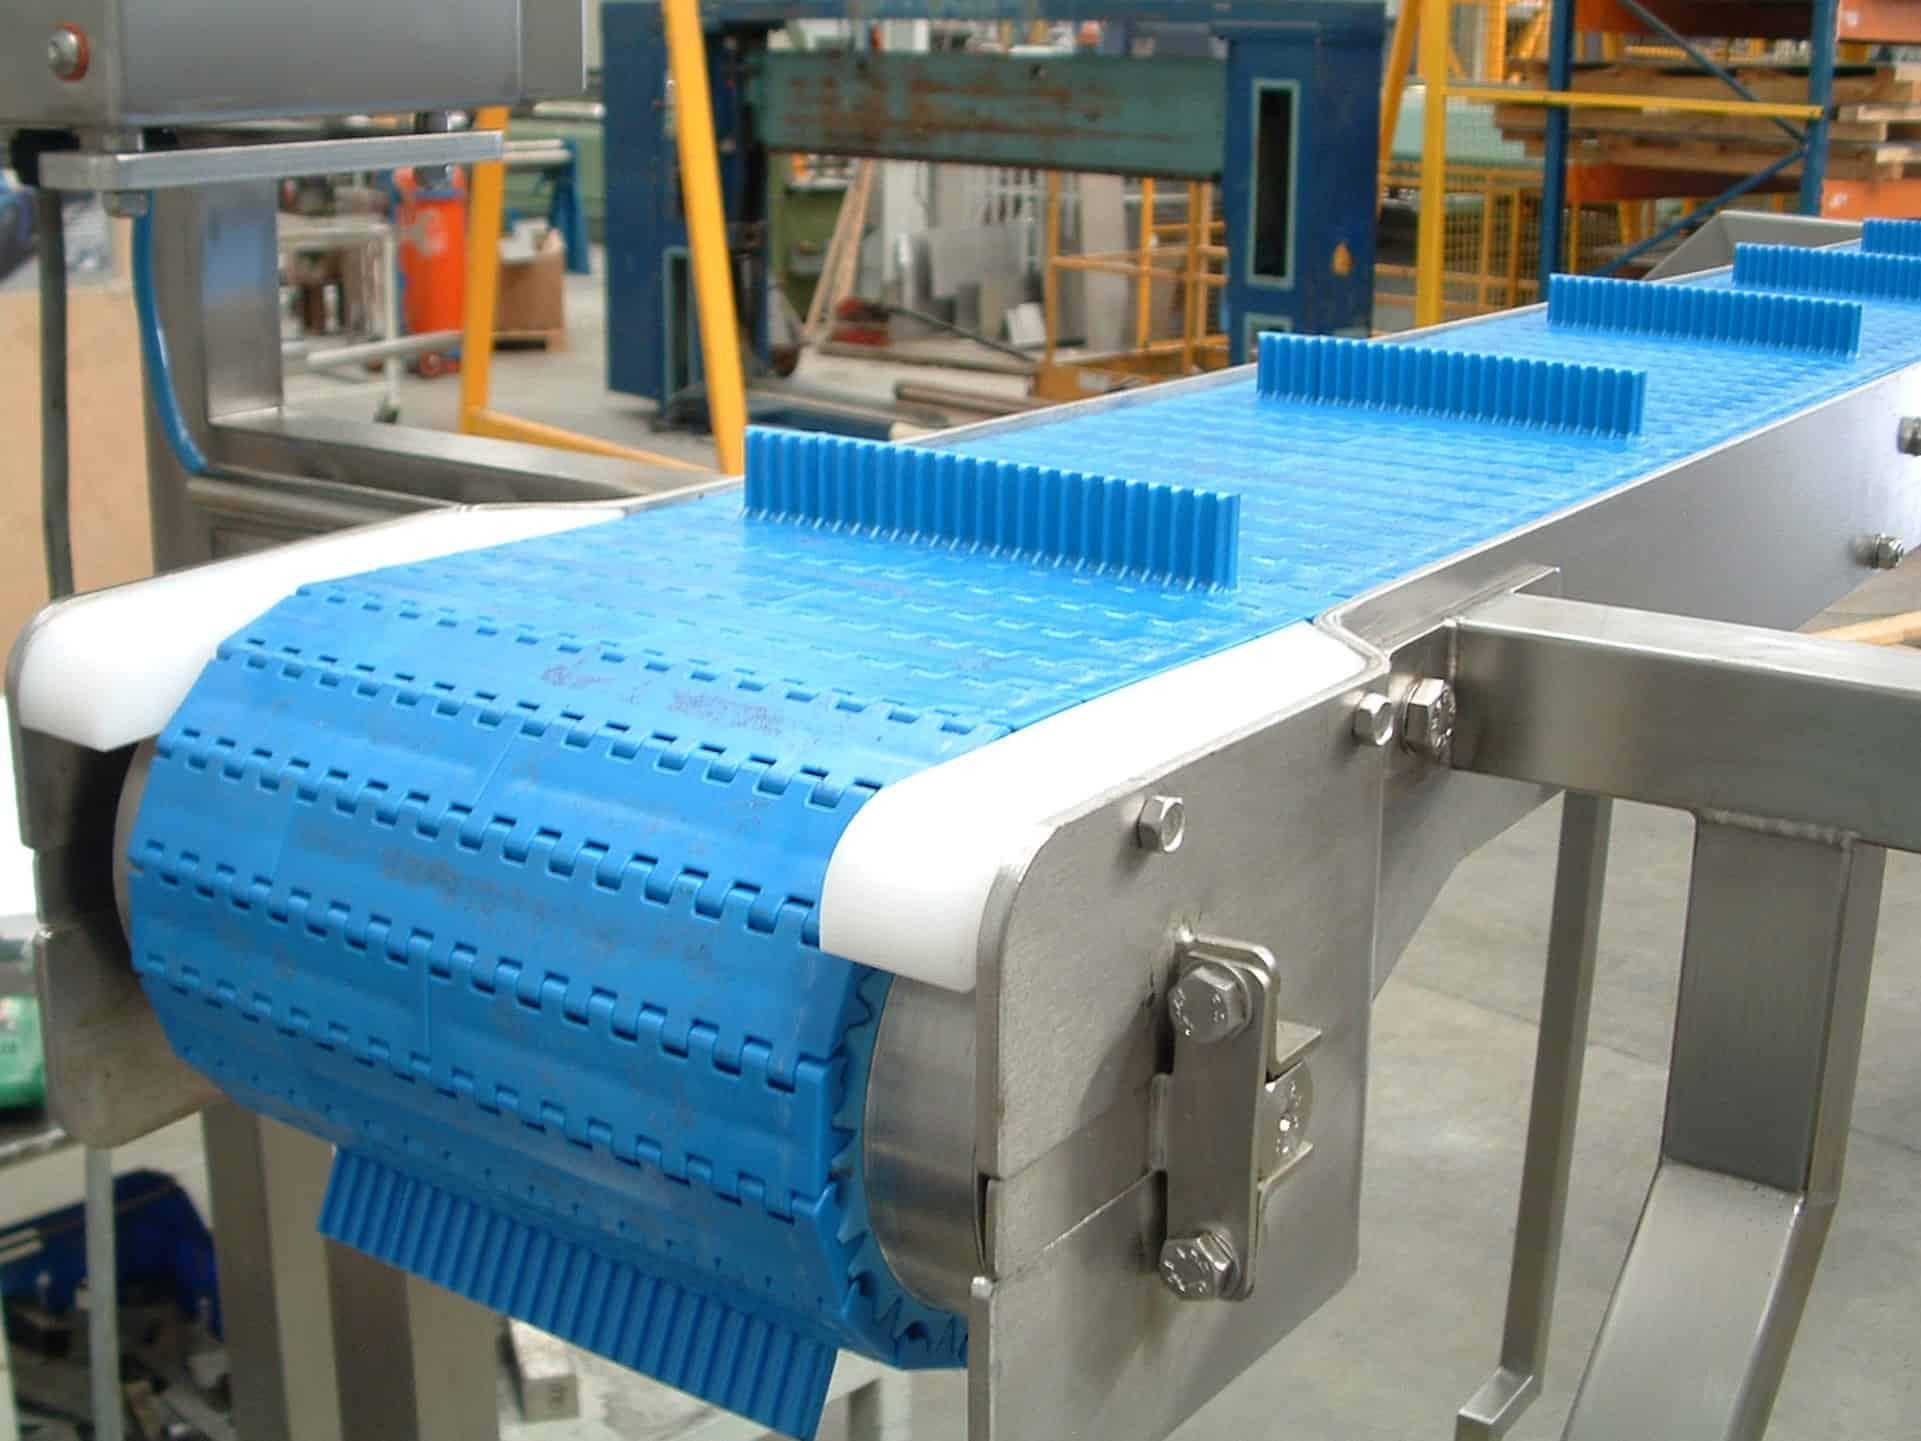 Modular Belt Conveyor Systems Wrightfield Conveyor Systems